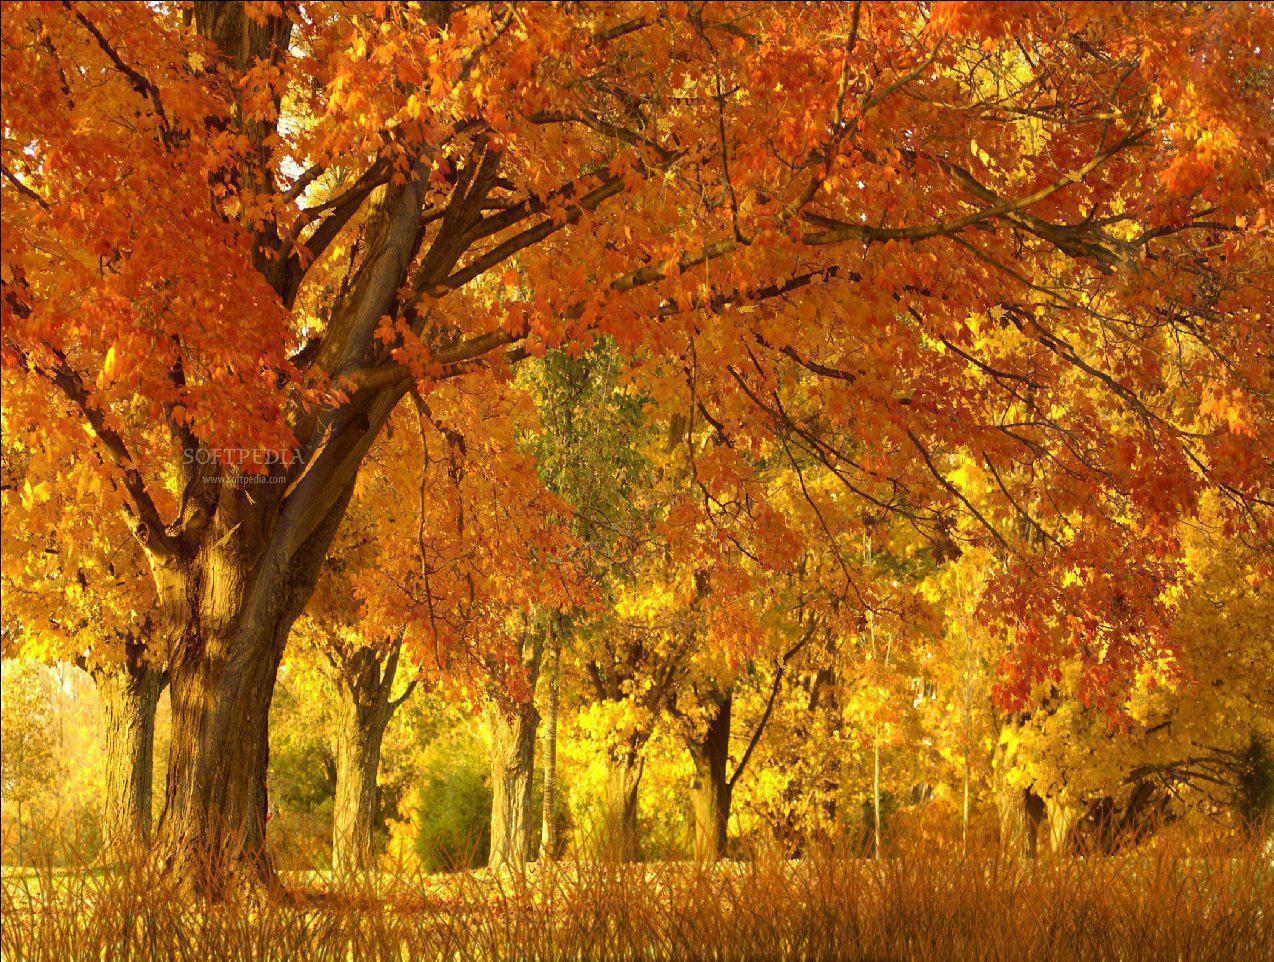 Falling Leaves Animated Wallpaper Fall Season Backgrounds Wallpaper Cave